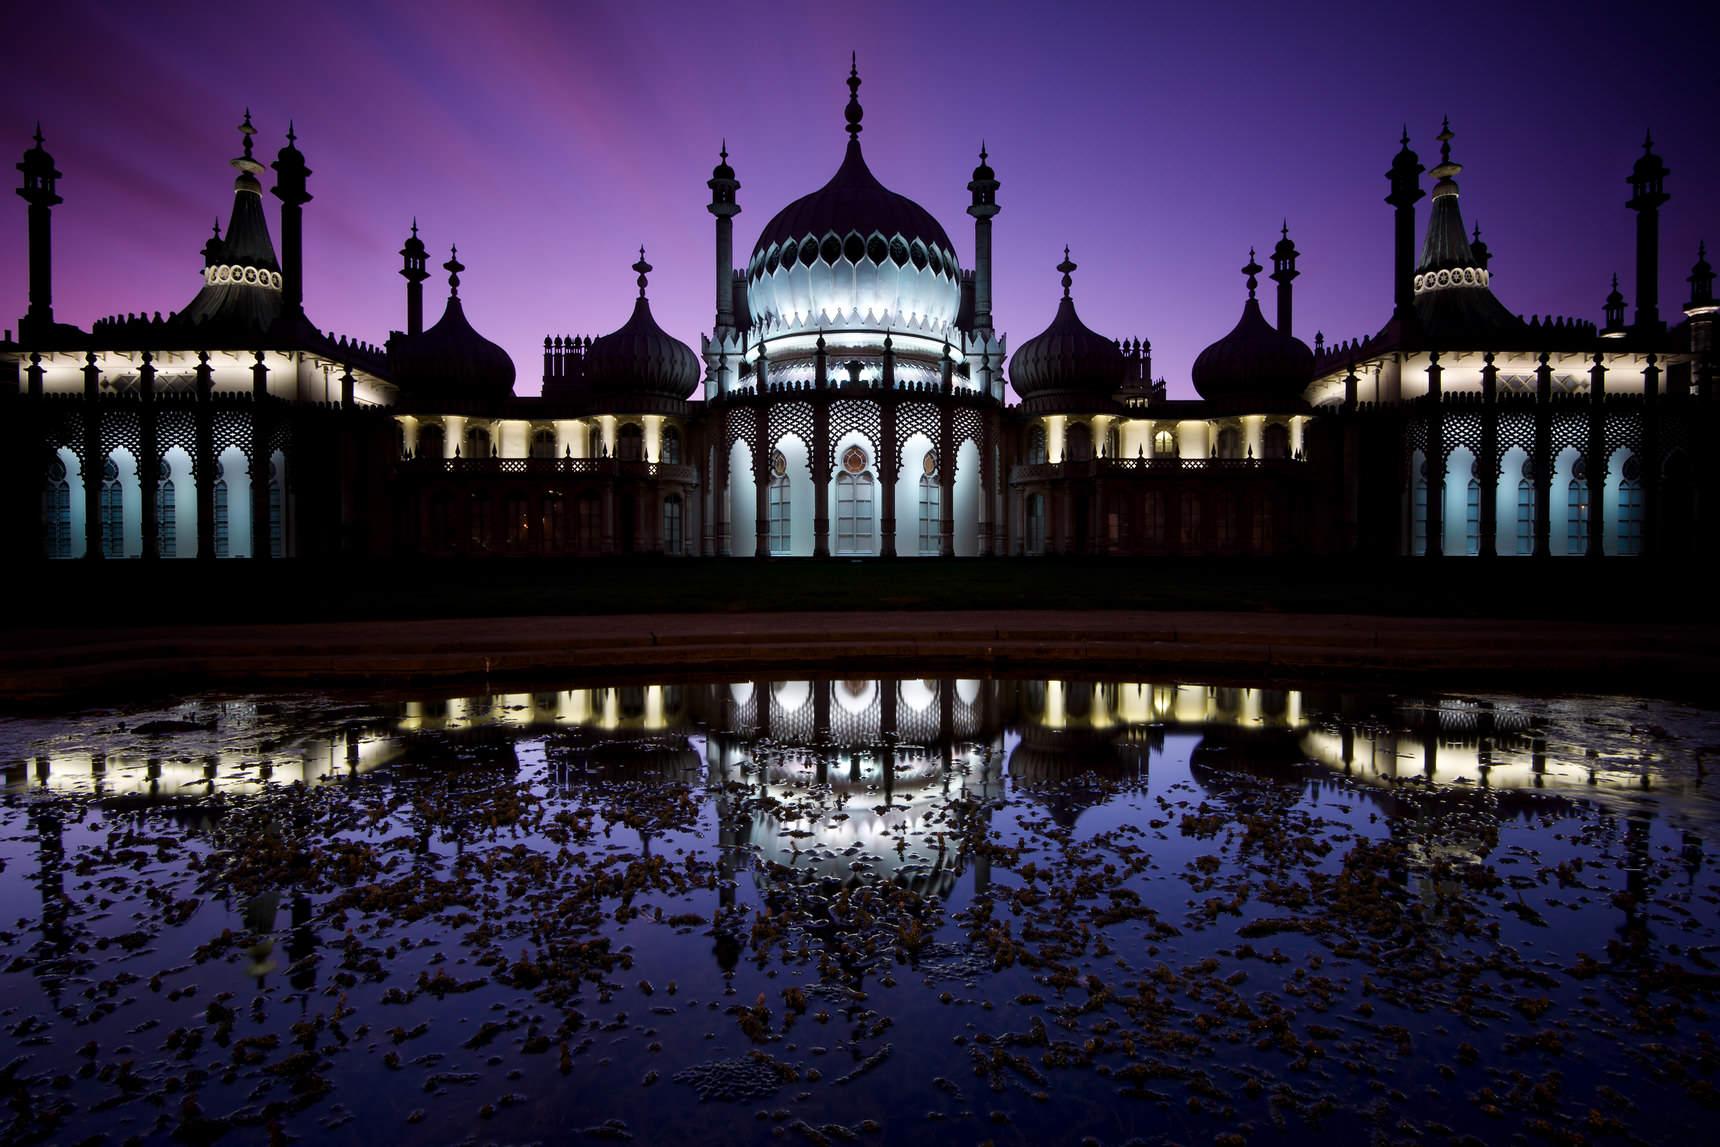 Twilight Pavilion